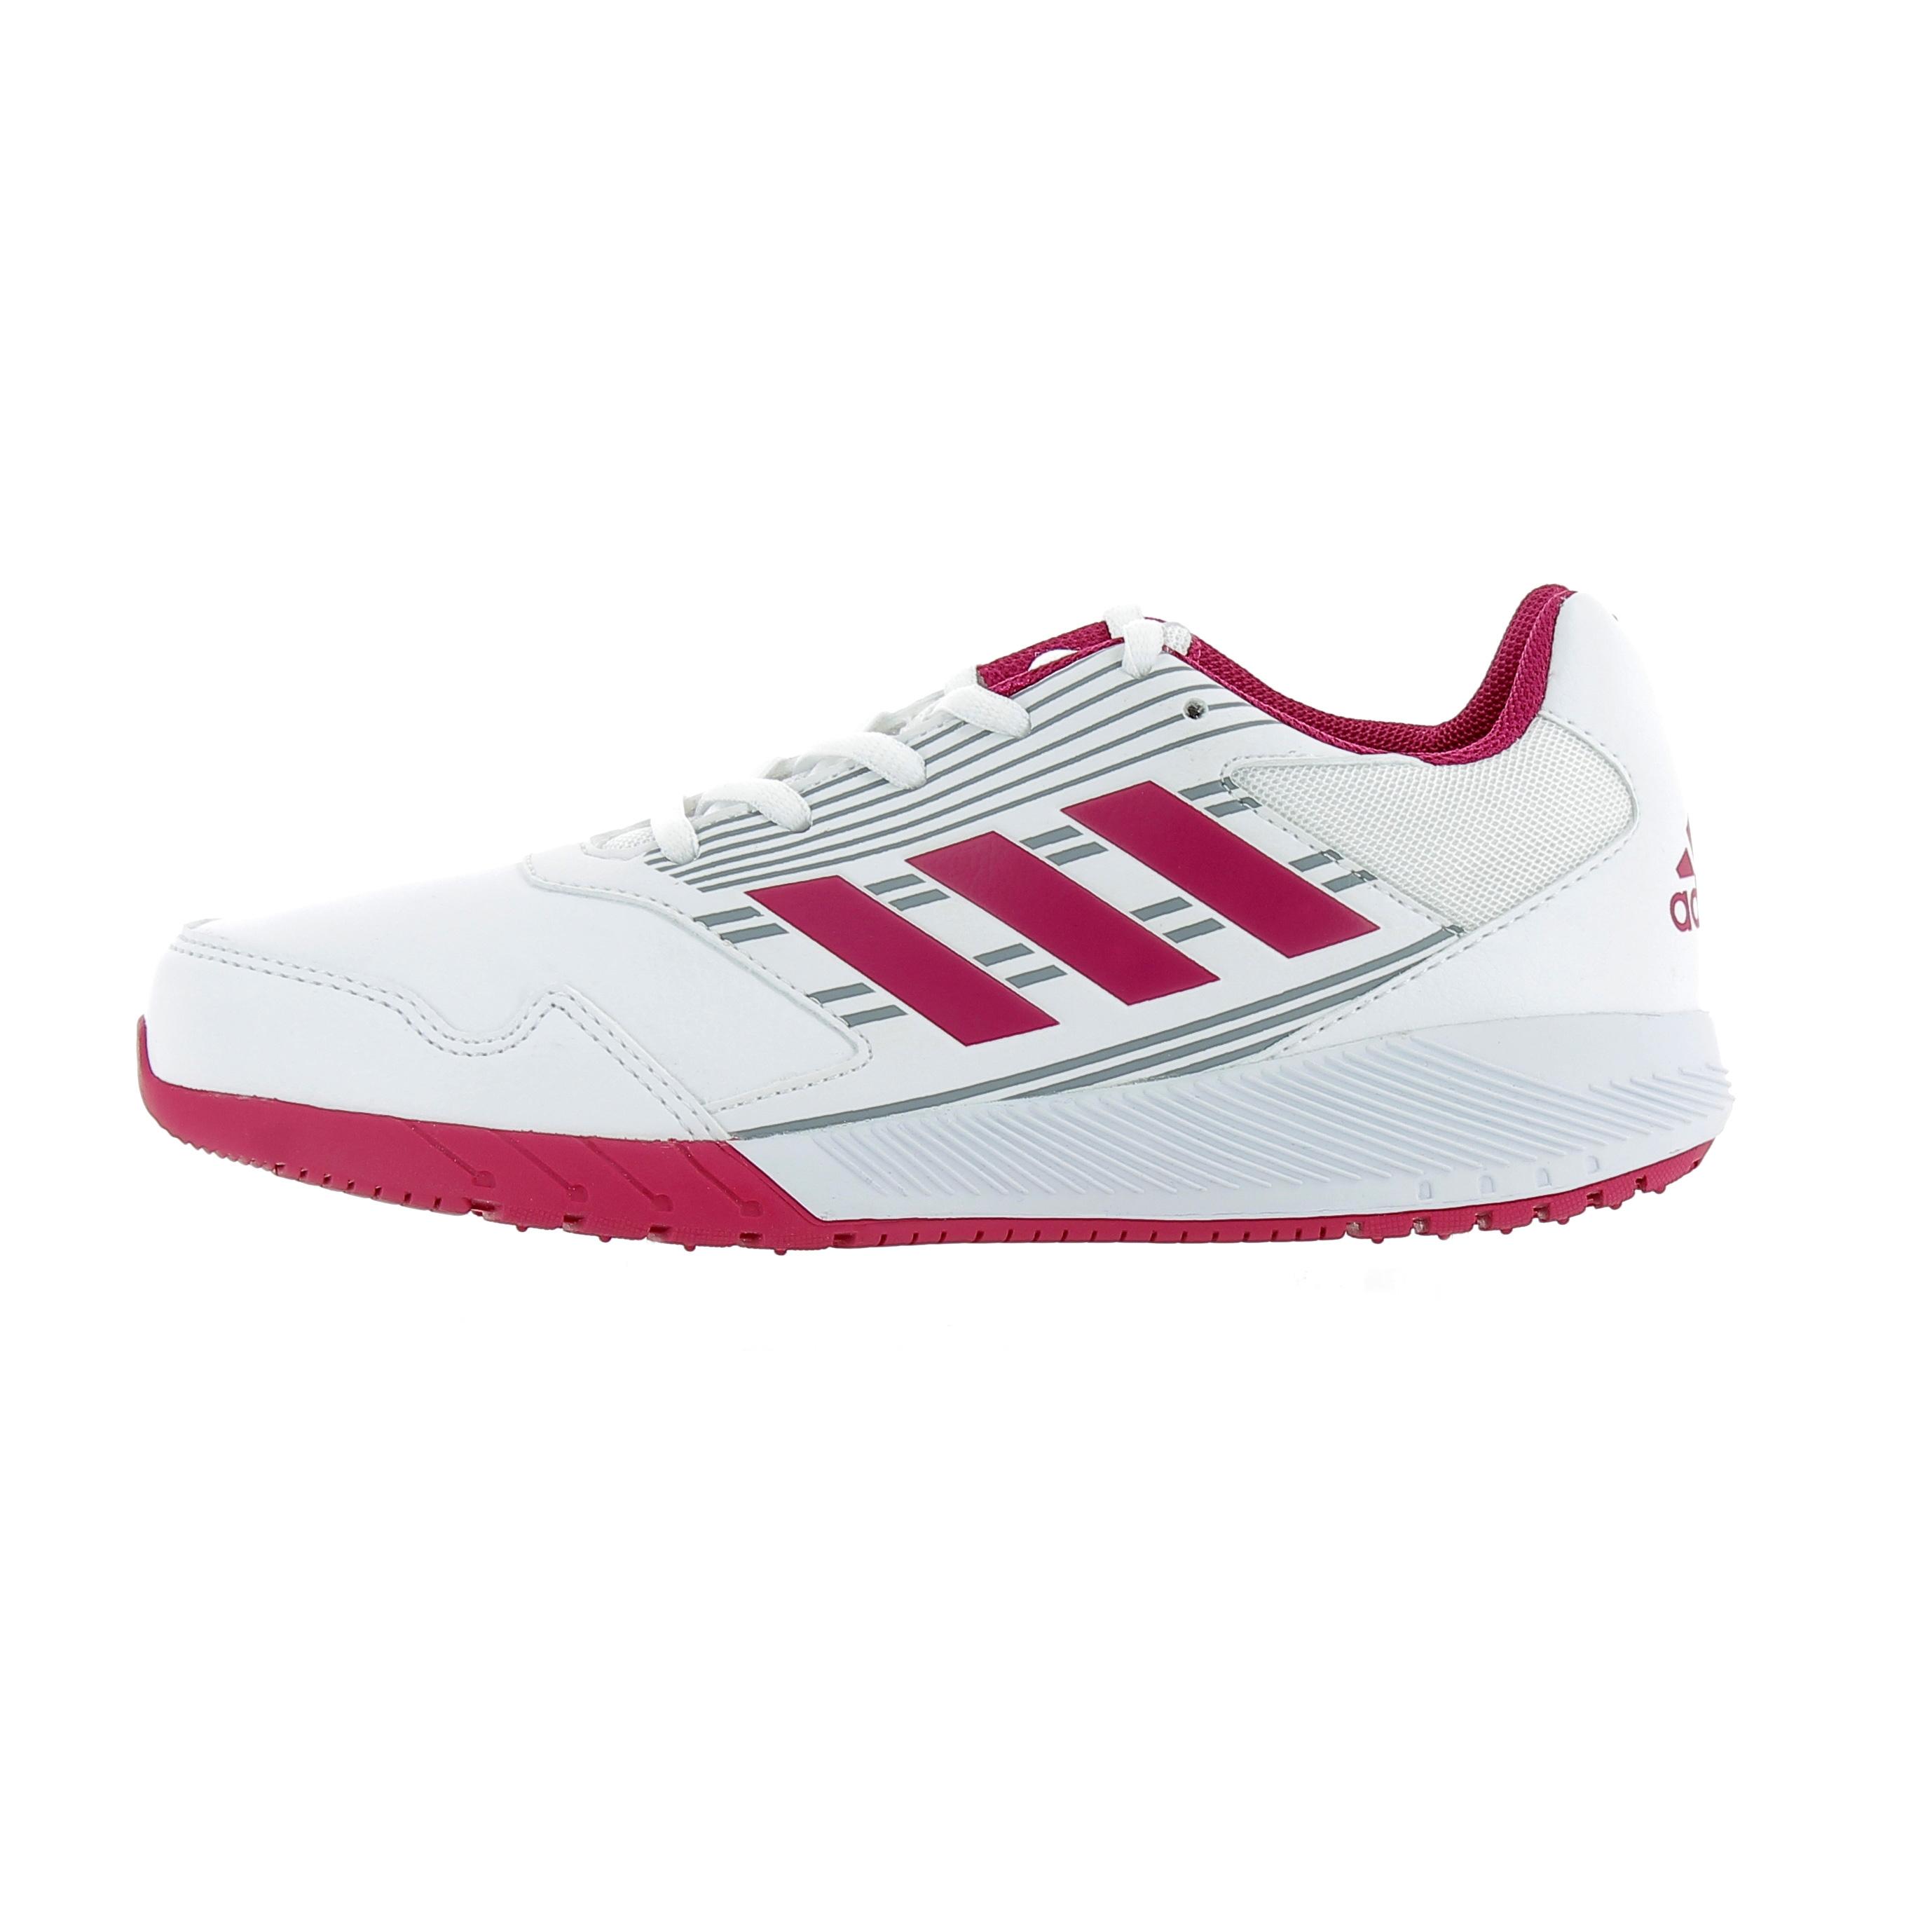 84cec0786177e Chaussures Enfant adidas running Altarun K Blanc   Rose